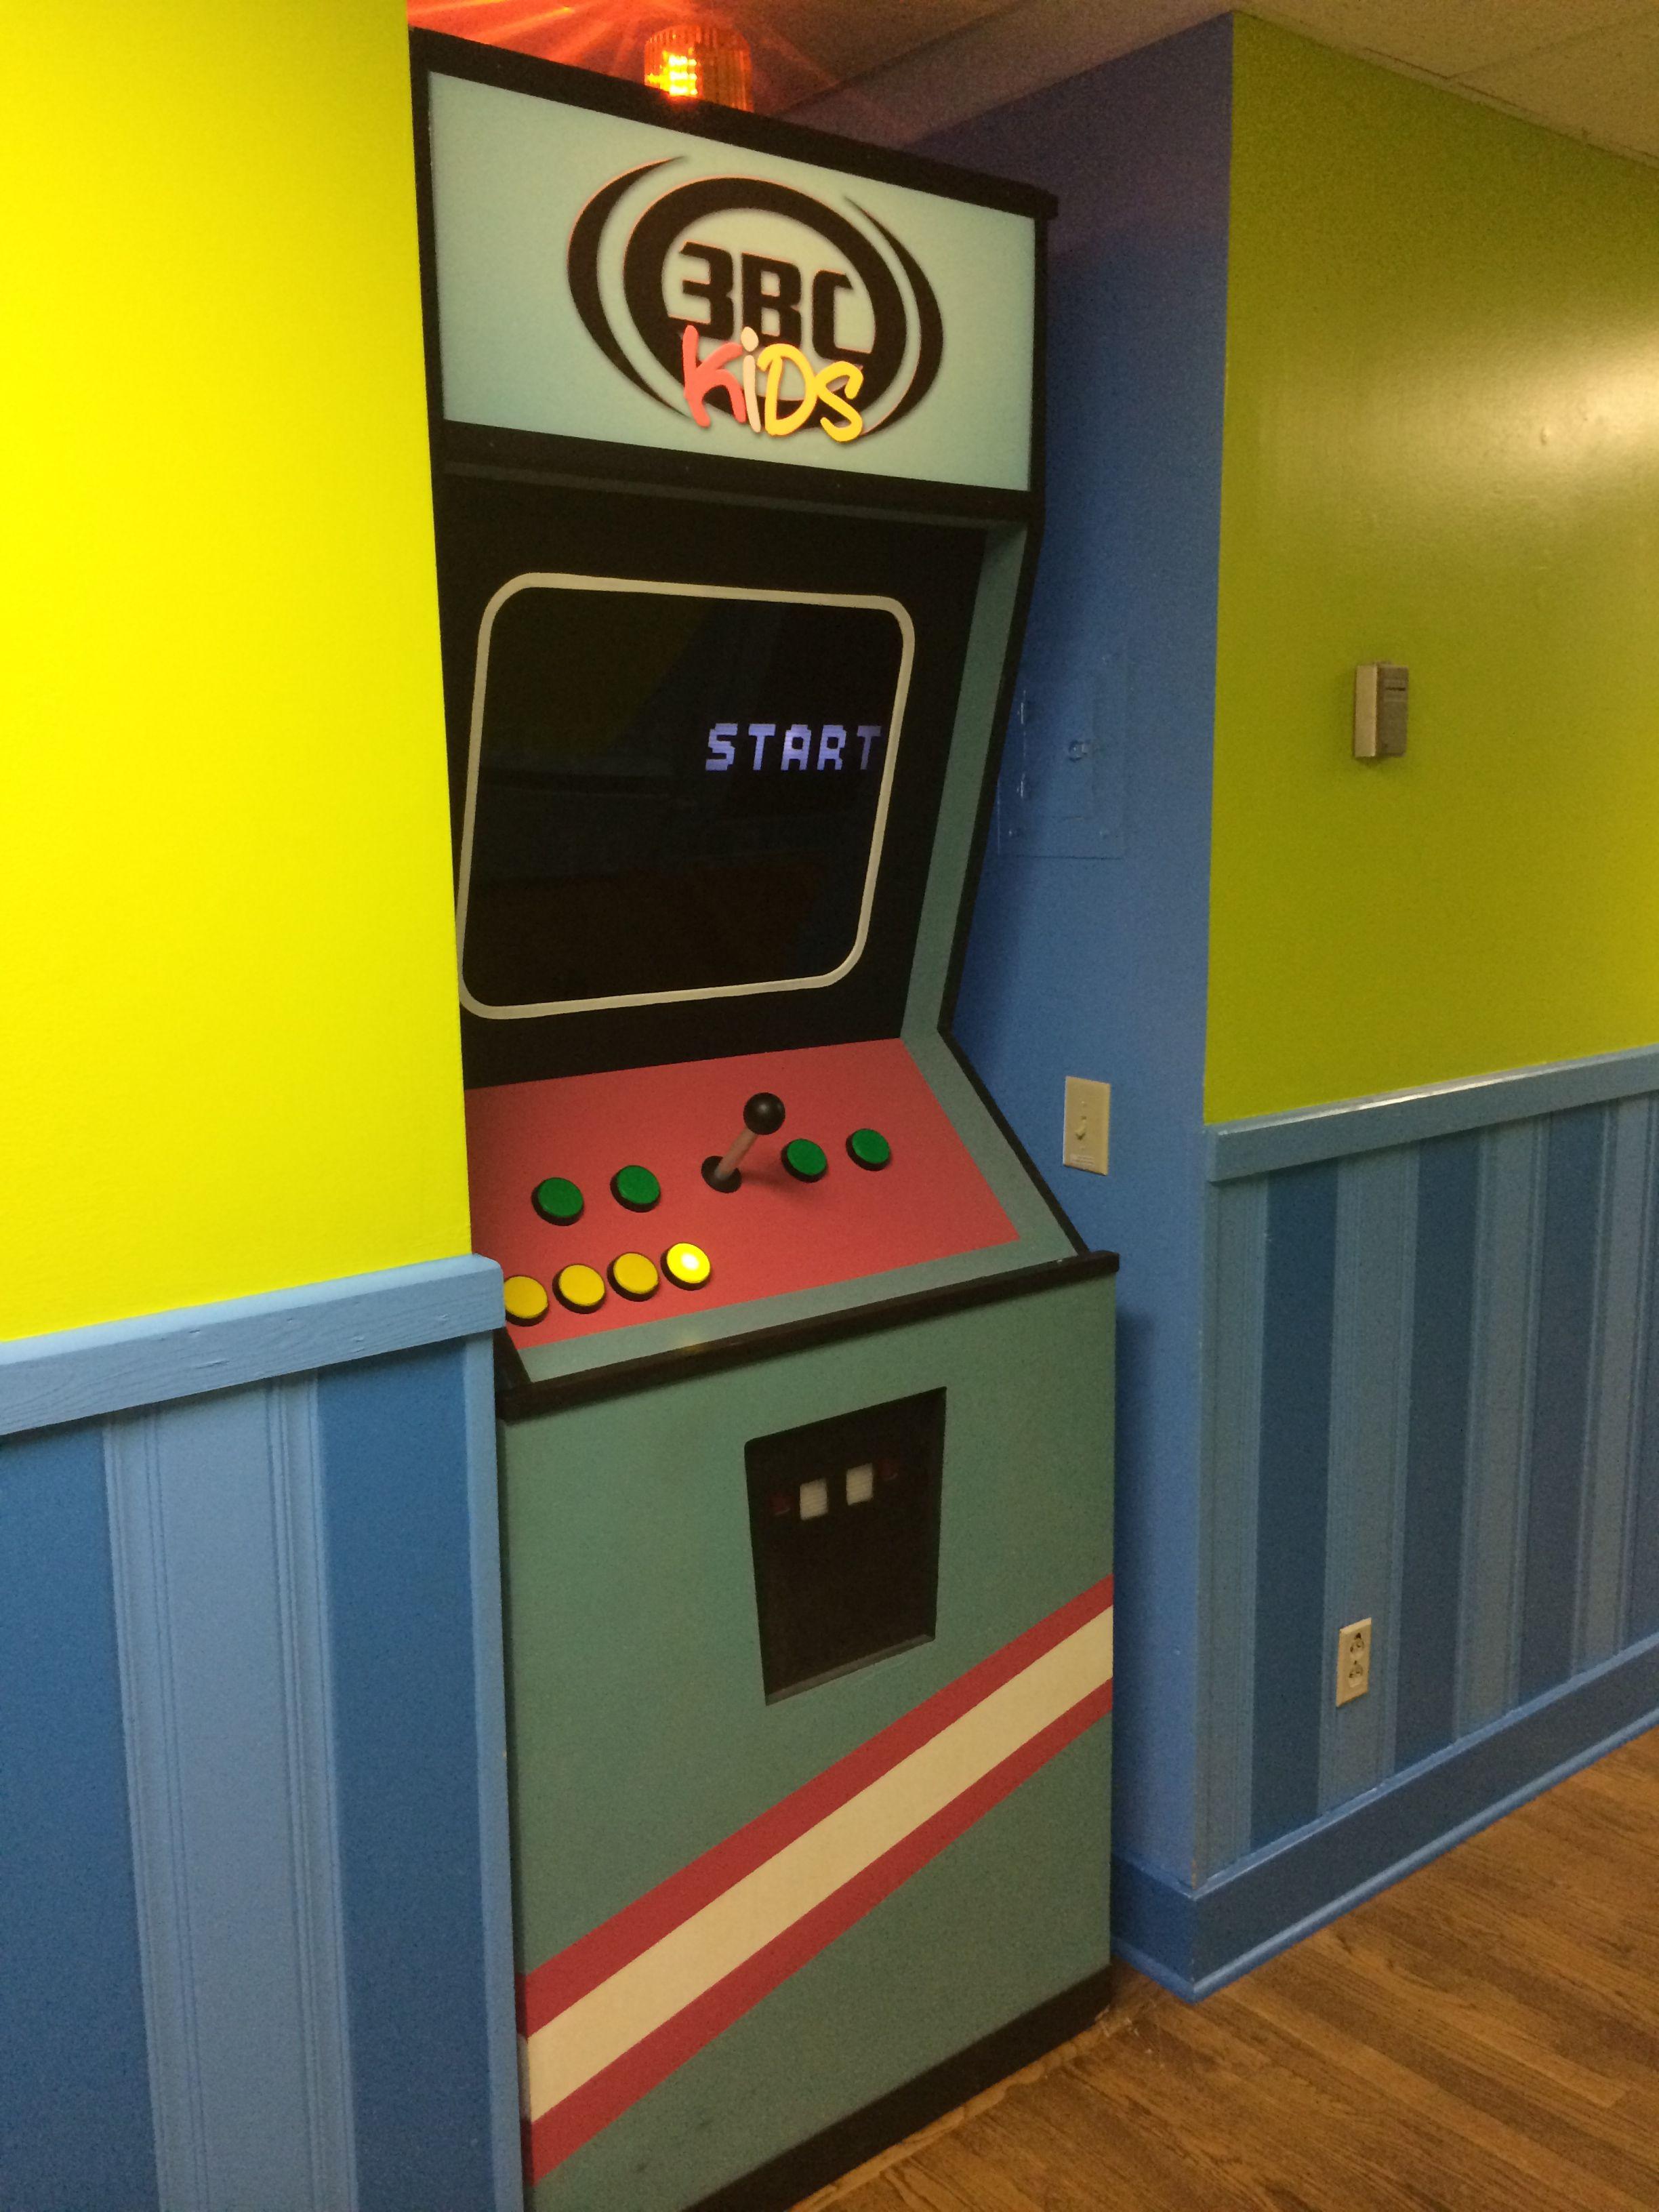 3BC Kids - Arcade Prop on 3rd Floor